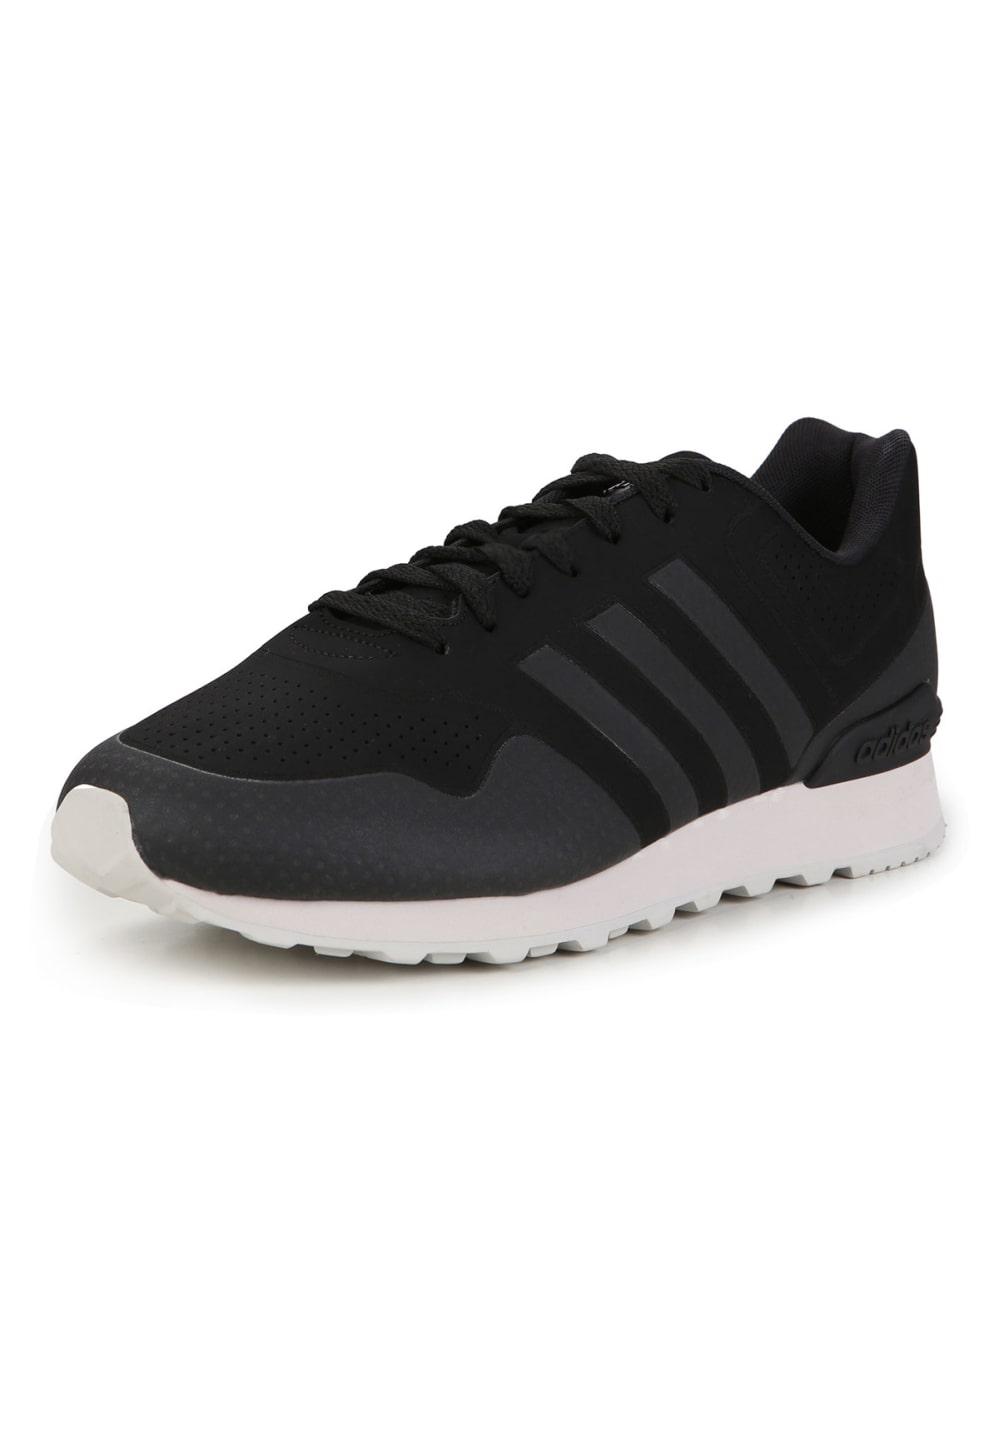 Casual Hombre Adidas 10k Zapatilla Para Negro Sneaker 4j5Lqc3RA